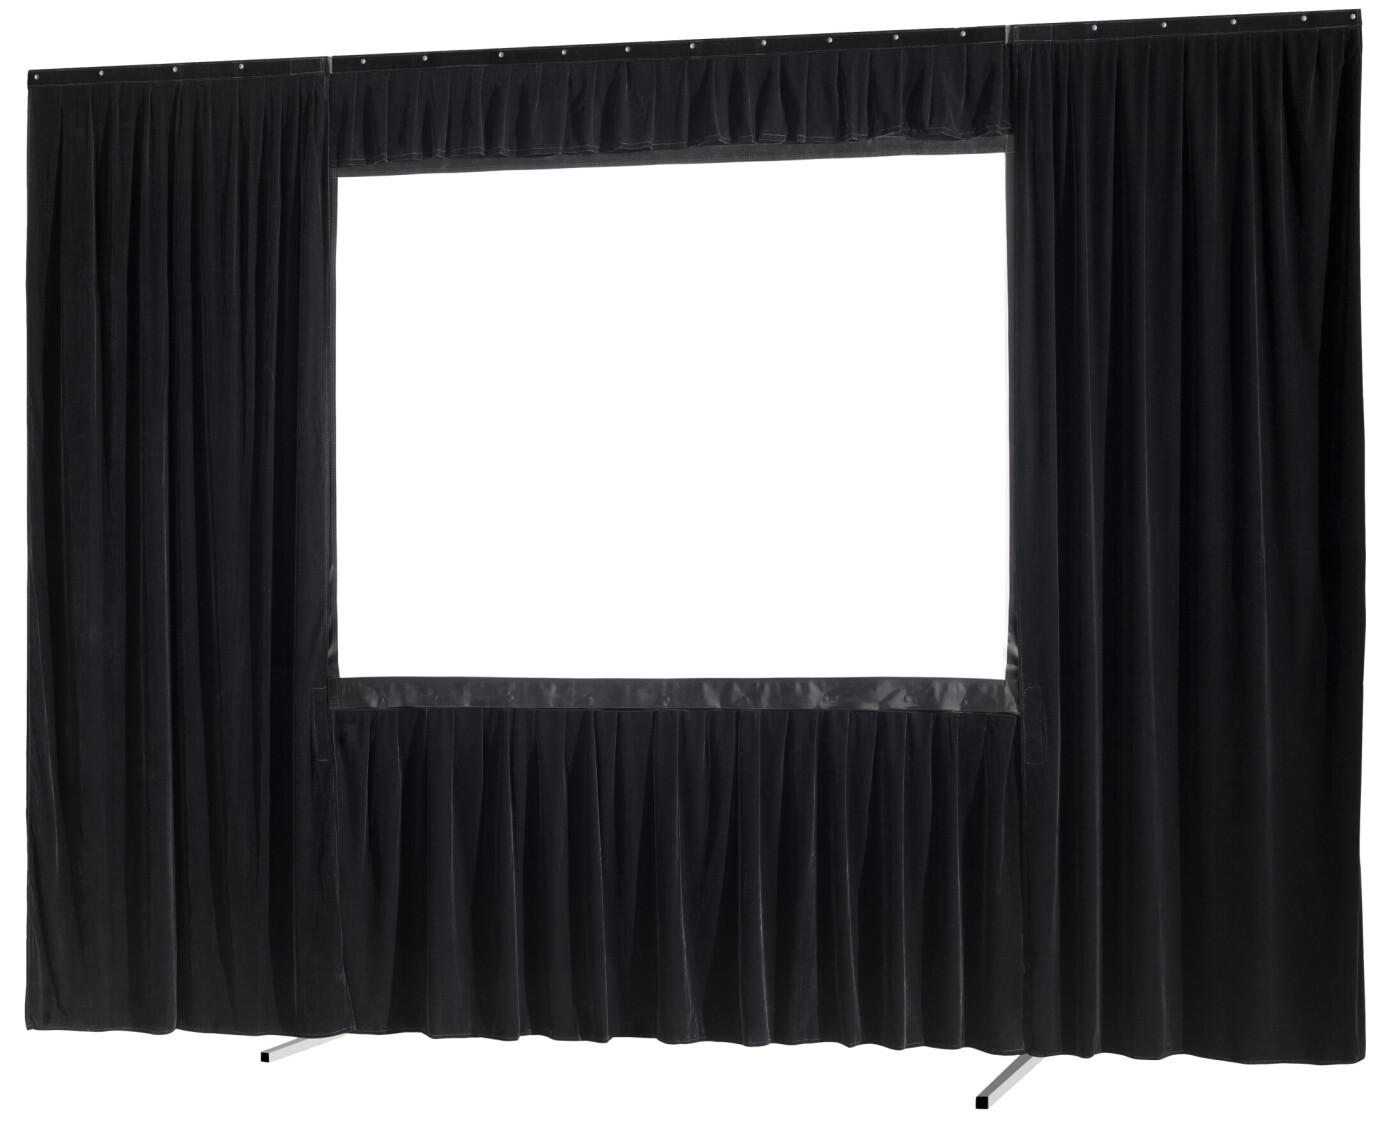 celexon Vorhangset 4-seitig für Faltrahmenleinwand Mobil Expert 305 x 190 cm